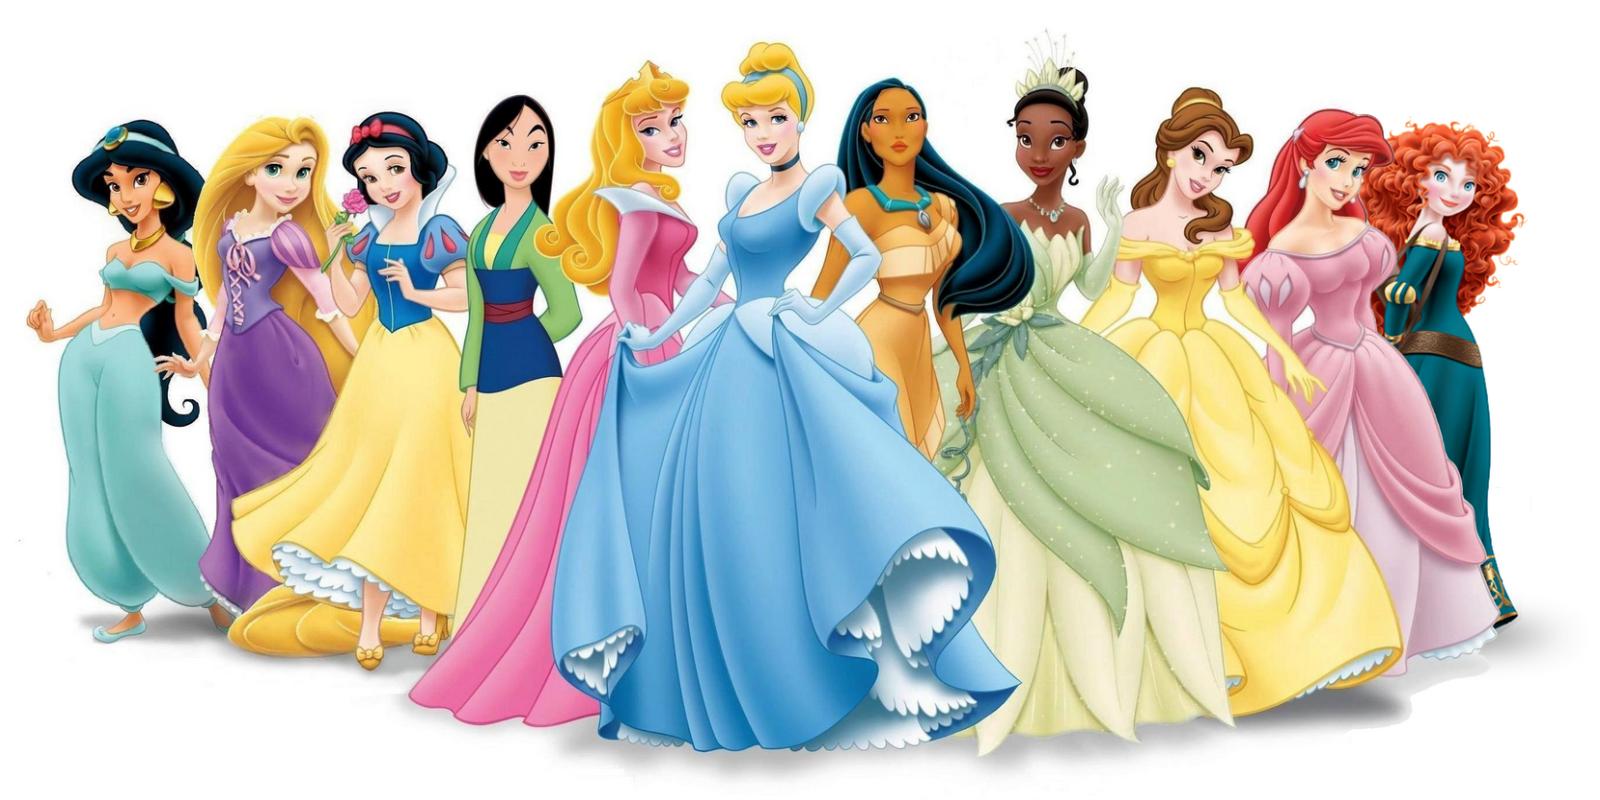 Disney character making pancakes clipart jpg free 10 Best Disney Princess Makeovers of 2015 jpg free